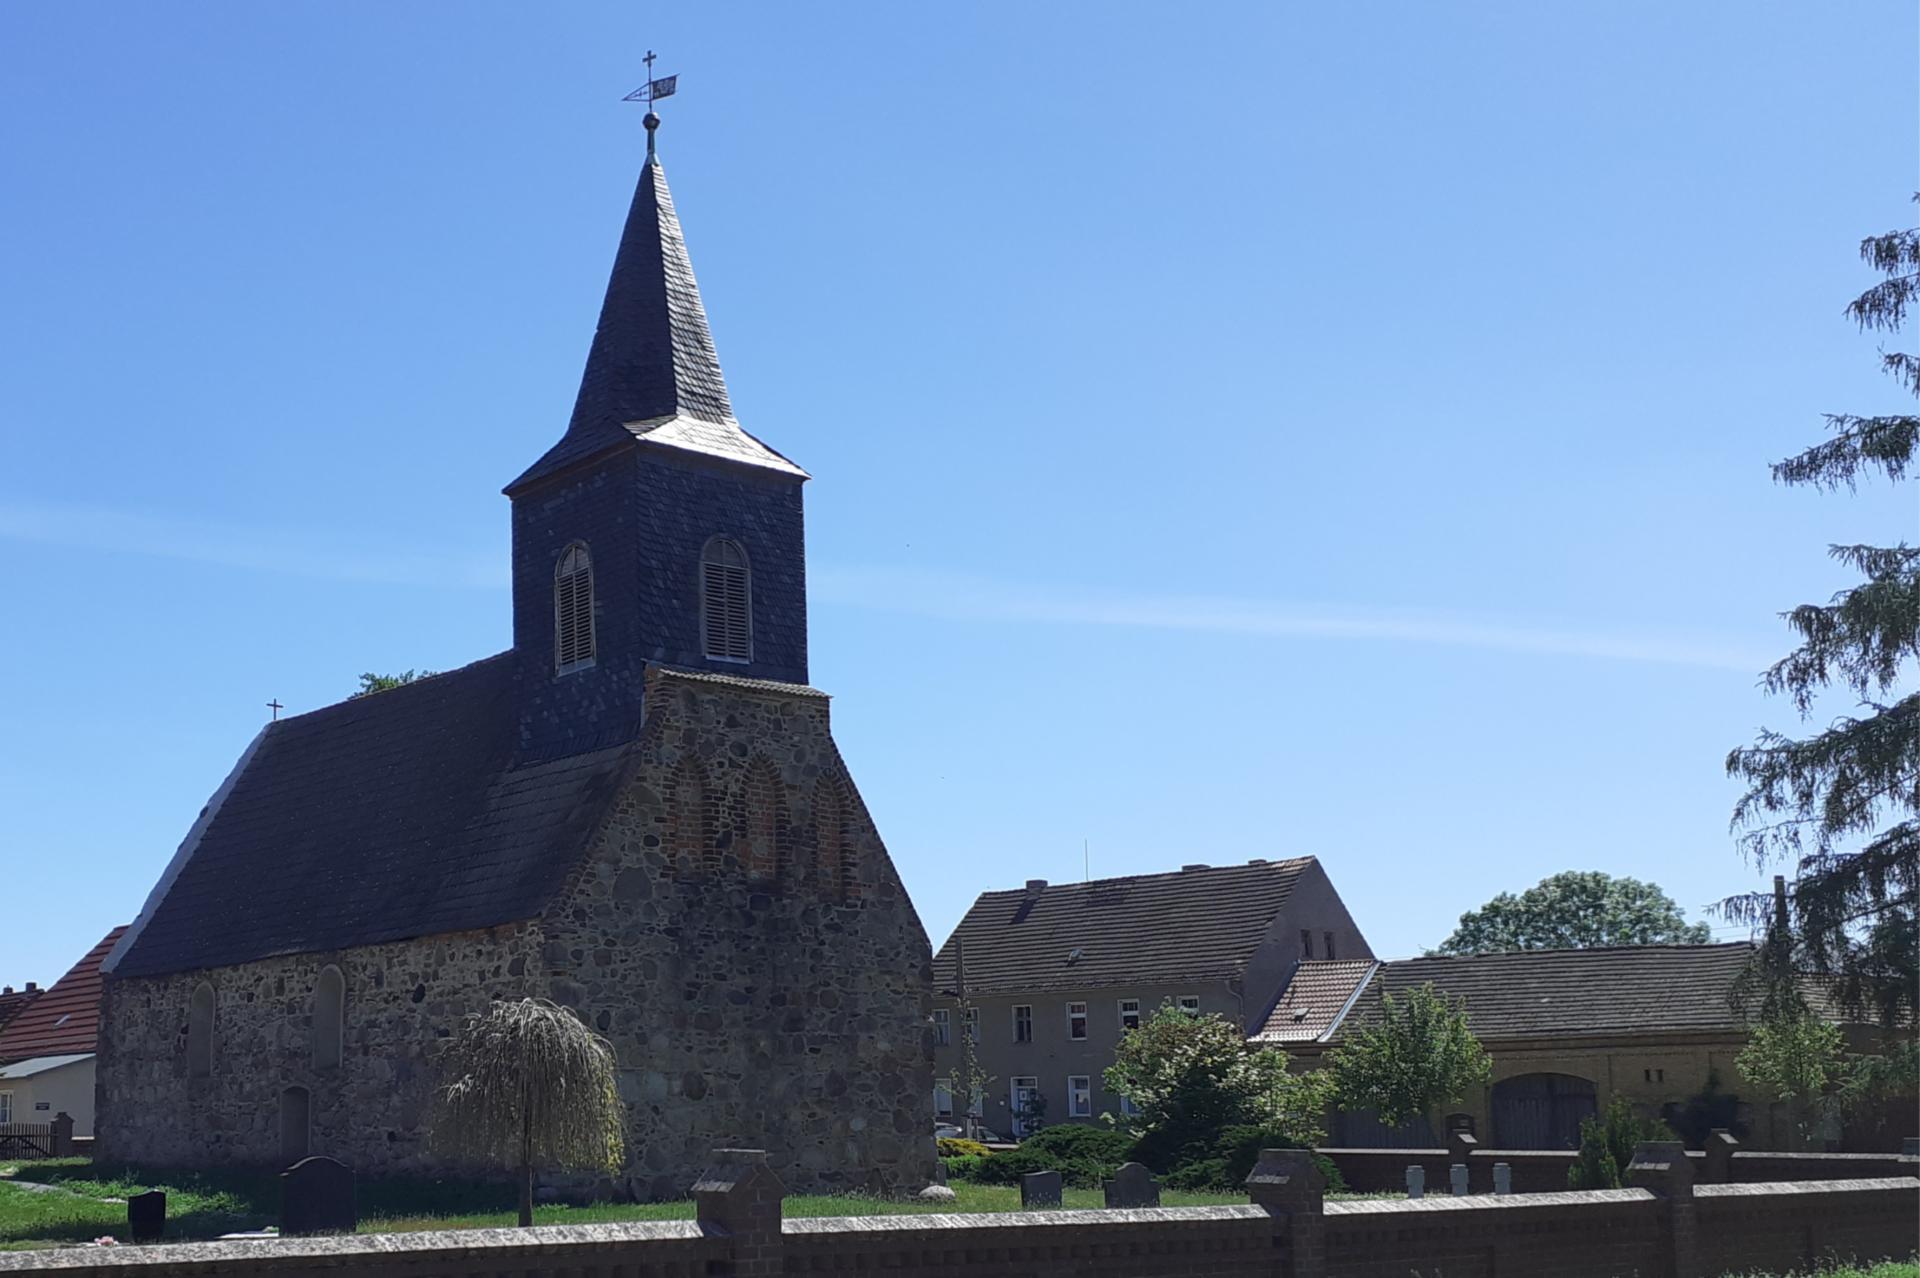 Kirche in Neuhof